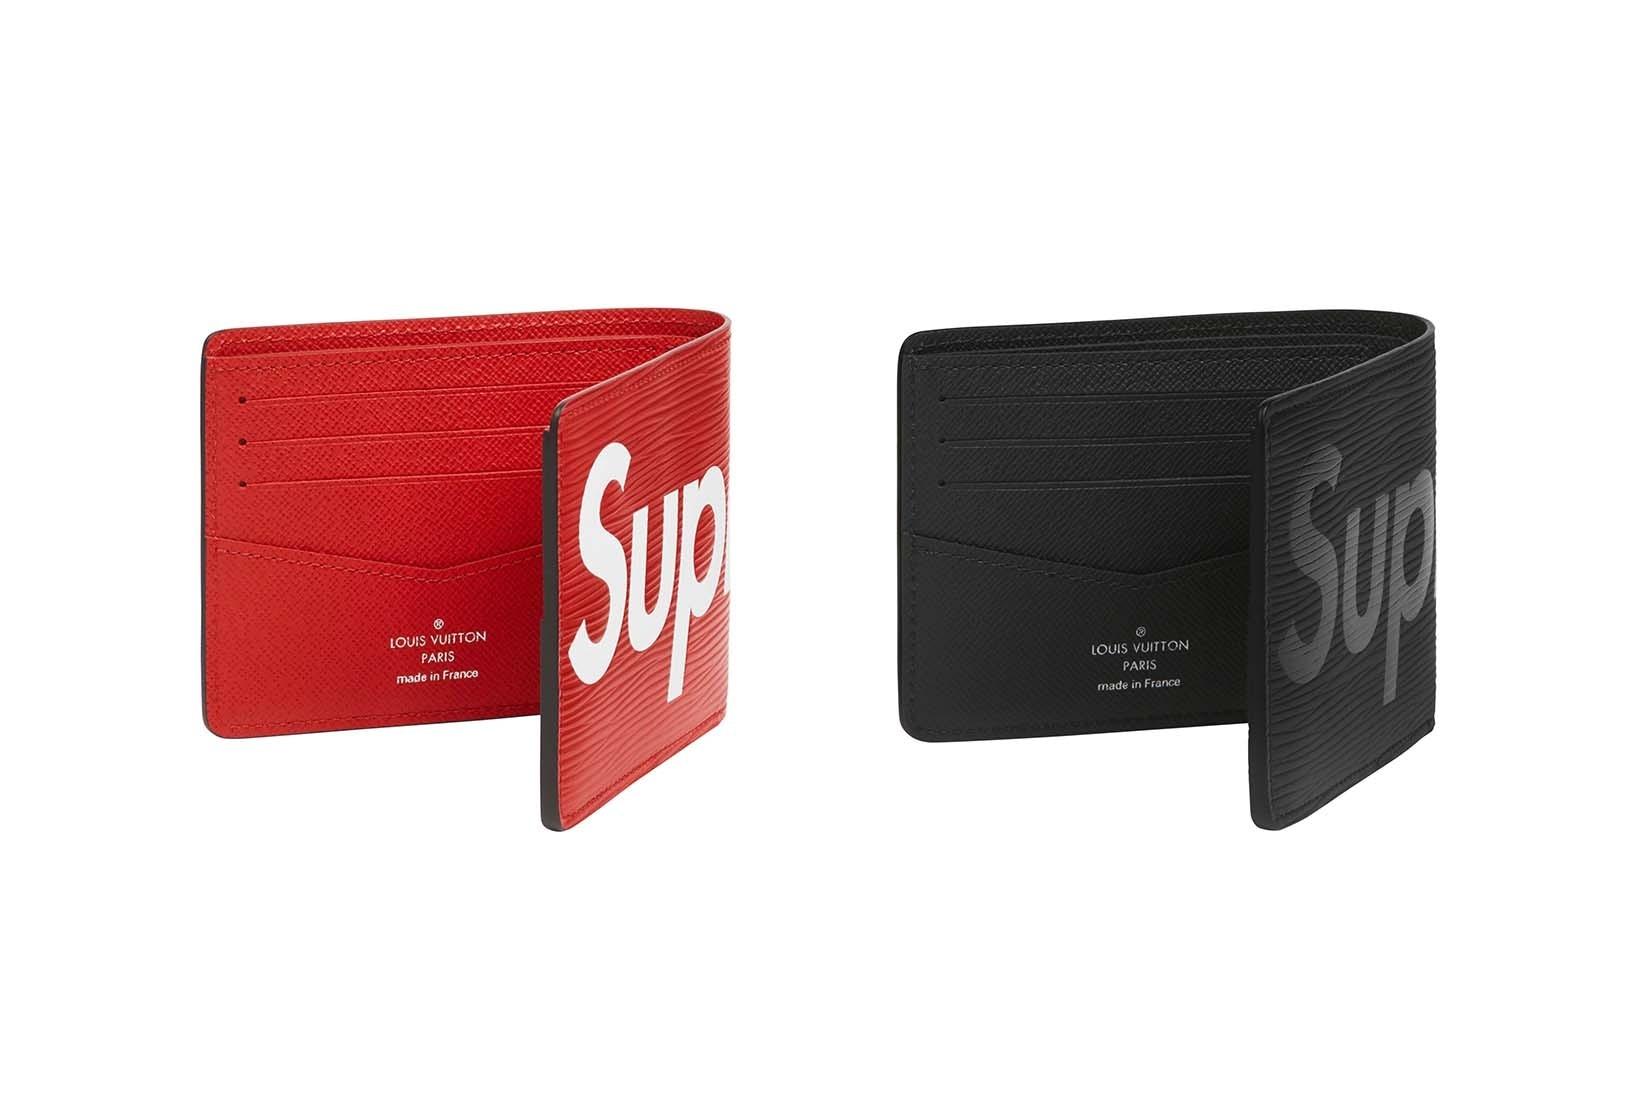 Supreme(シュプリーム)×Louis Vuitton(ルイ・ヴィトン) / ポルトフォイユ スレンダー(PF Slender)